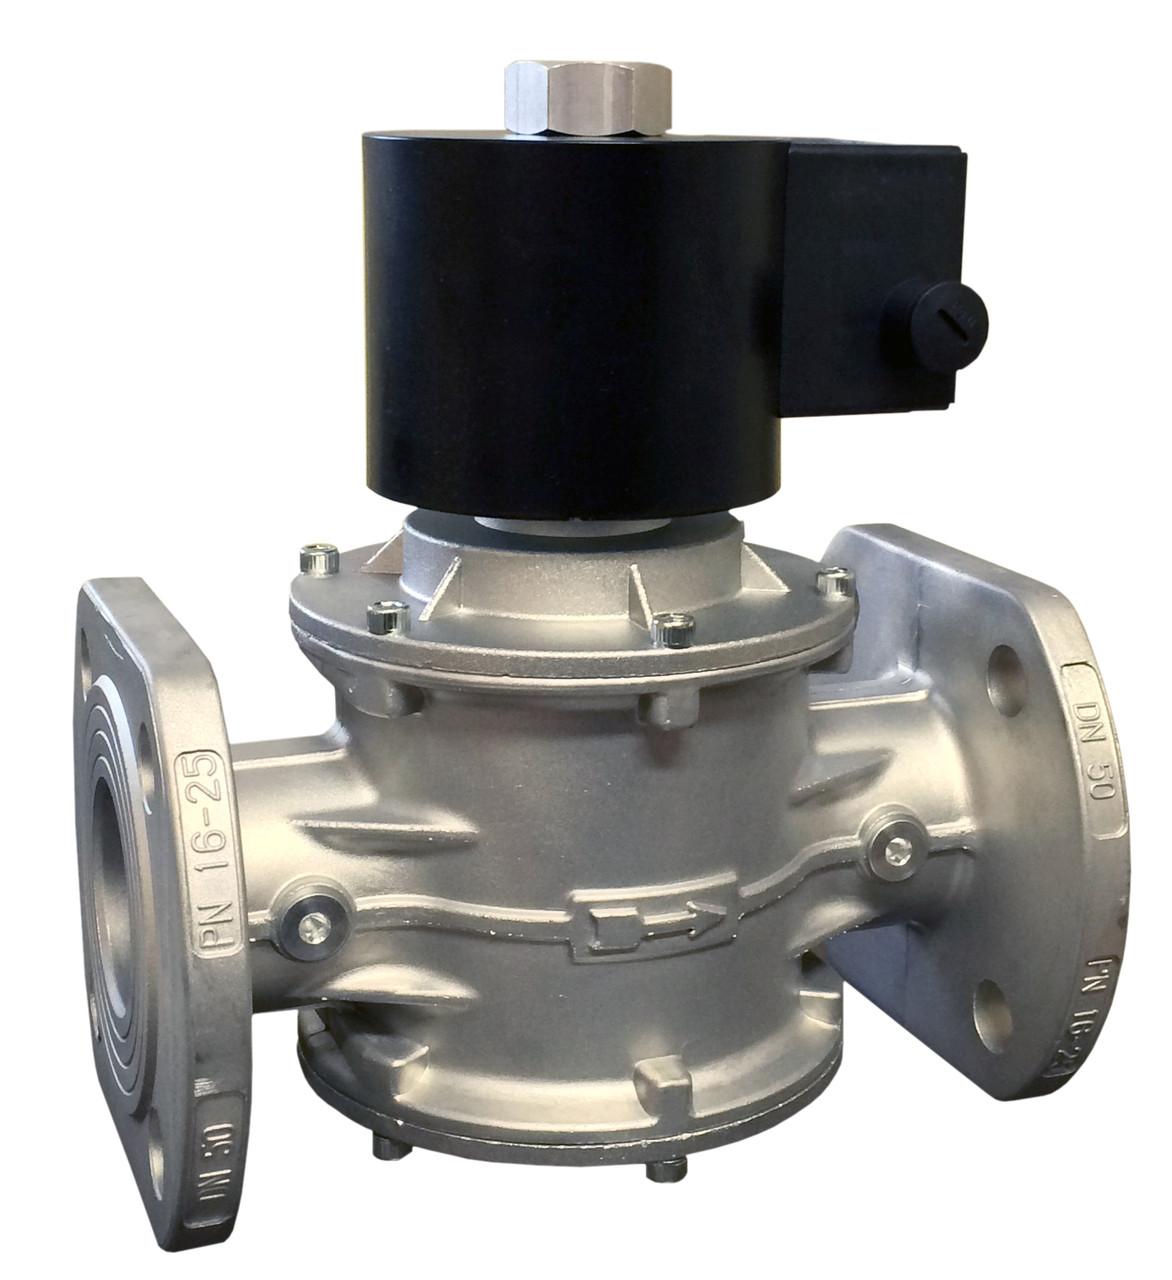 Электромагнитный клапан EV-3, DN50, P=3 bar (MADAS), фланцевый